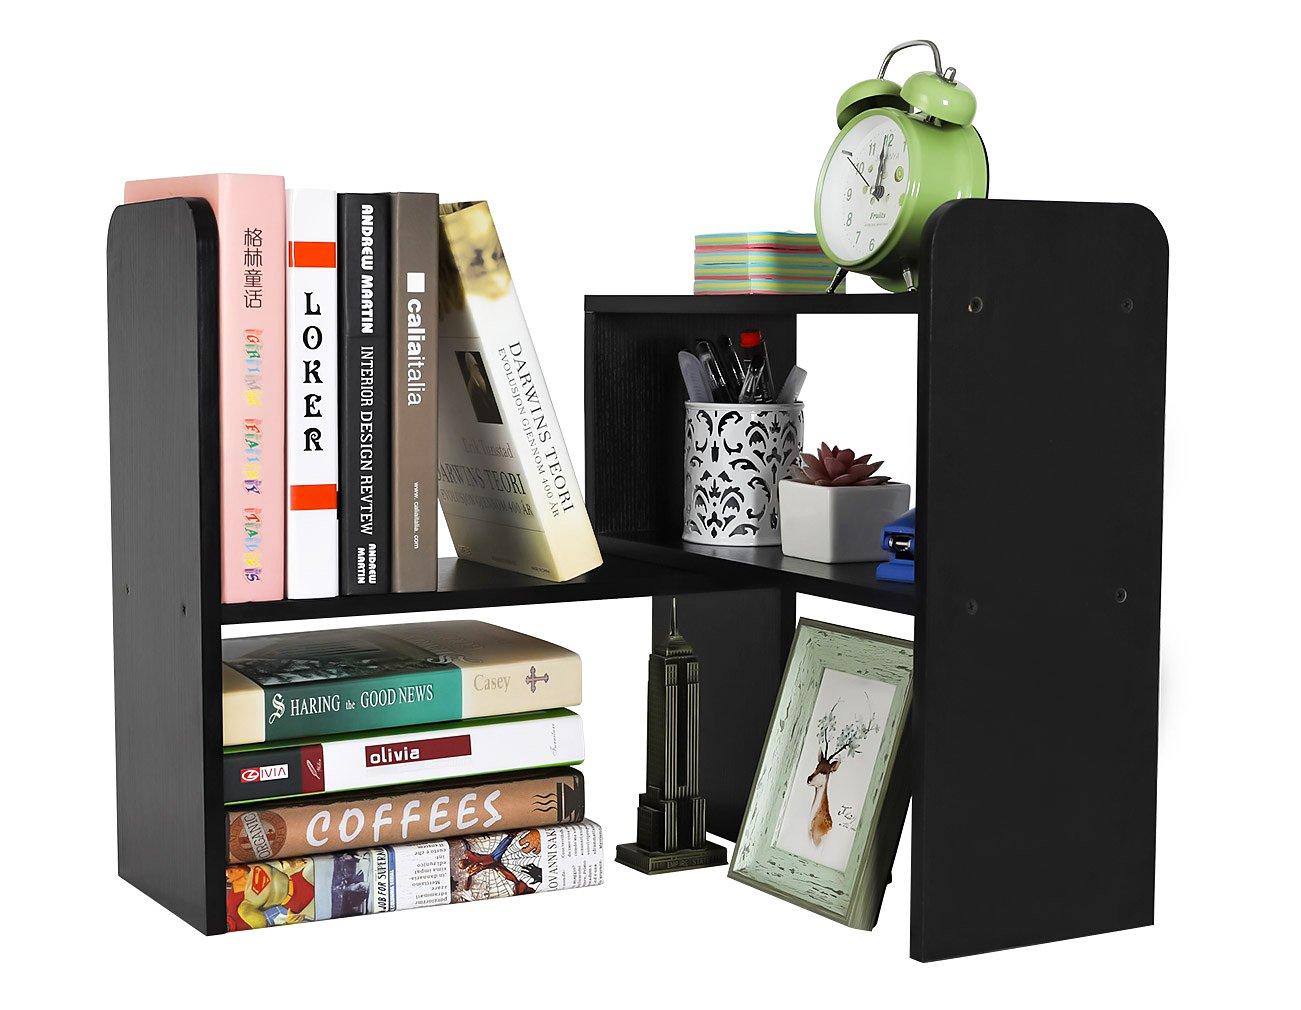 PAG Desktop Bookshelf Adjustable Countertop Bookcase Office Supplies Wood Desk Organizer Accessories Display Rack, Black by PAG